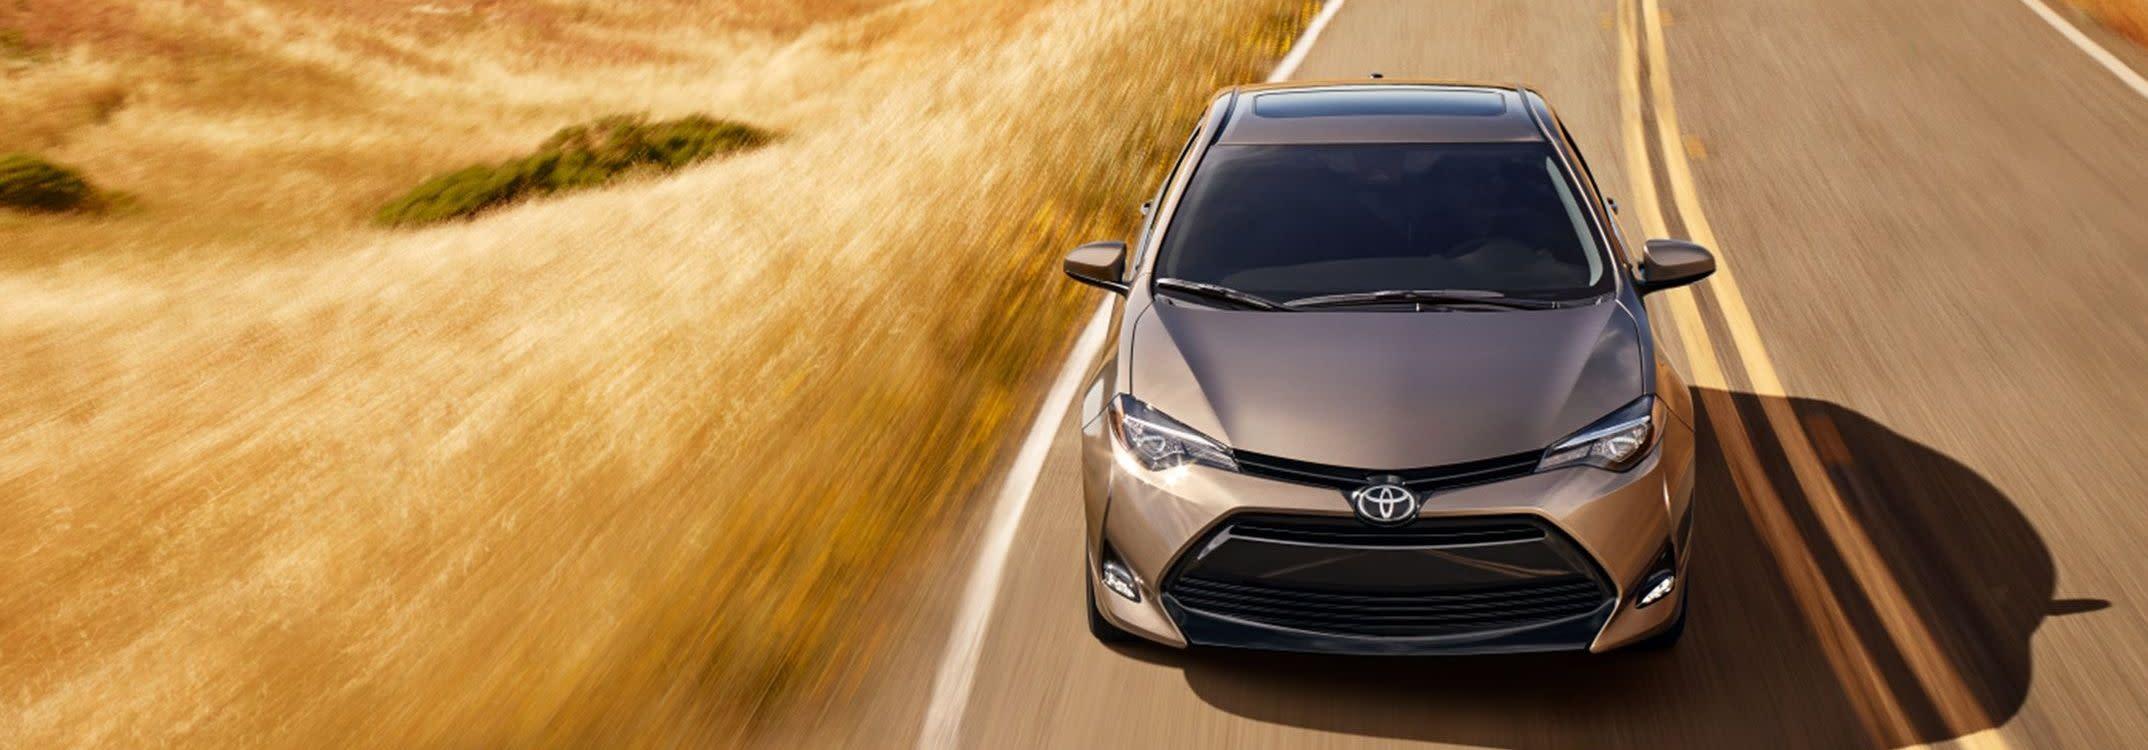 Toyota Corolla Owners Manual: Bulb locations